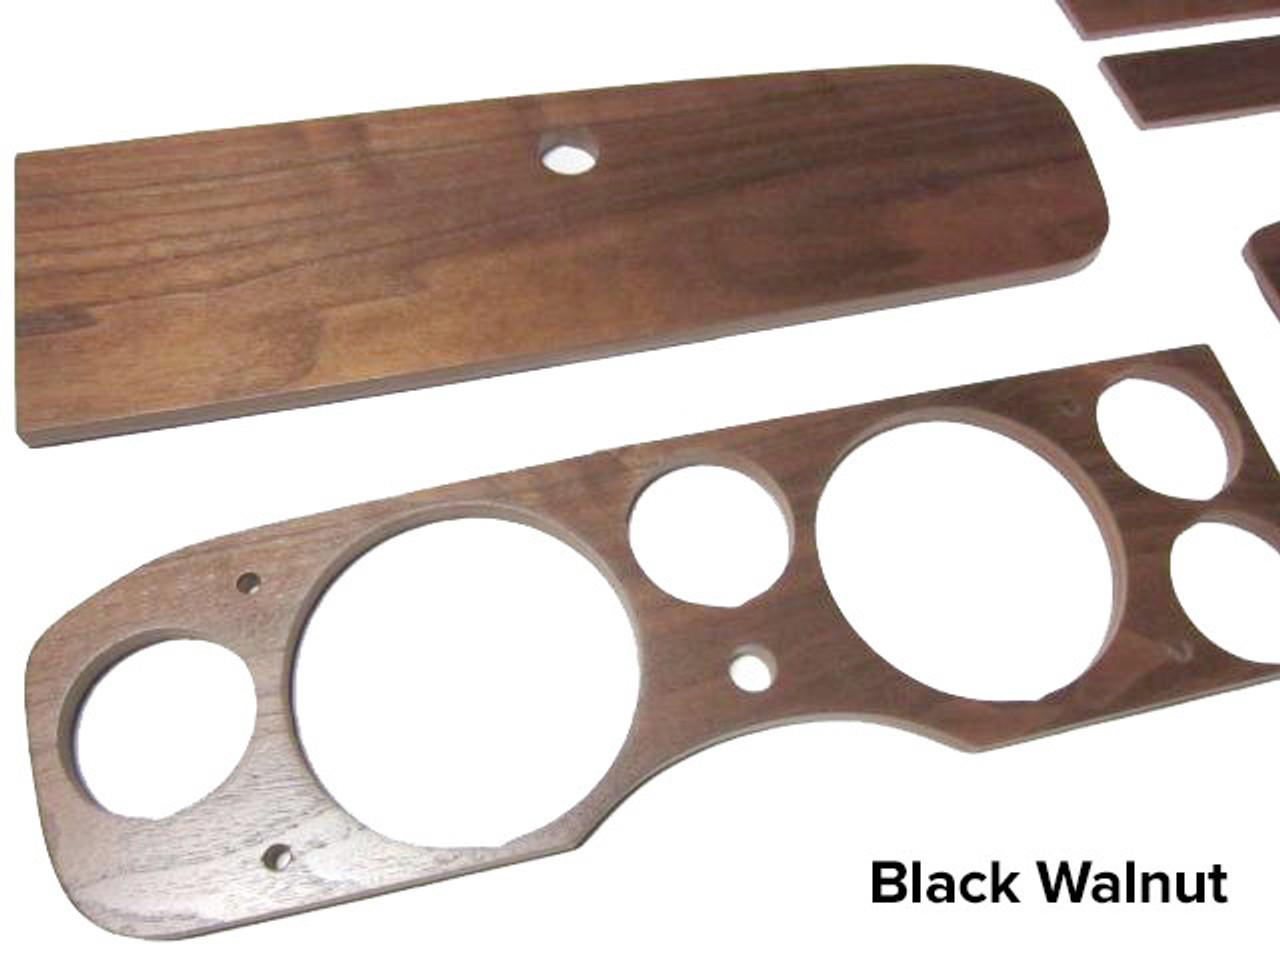 FIAT 124 Spider Dash Wood Set - Black Walnut - Auto Ricambi